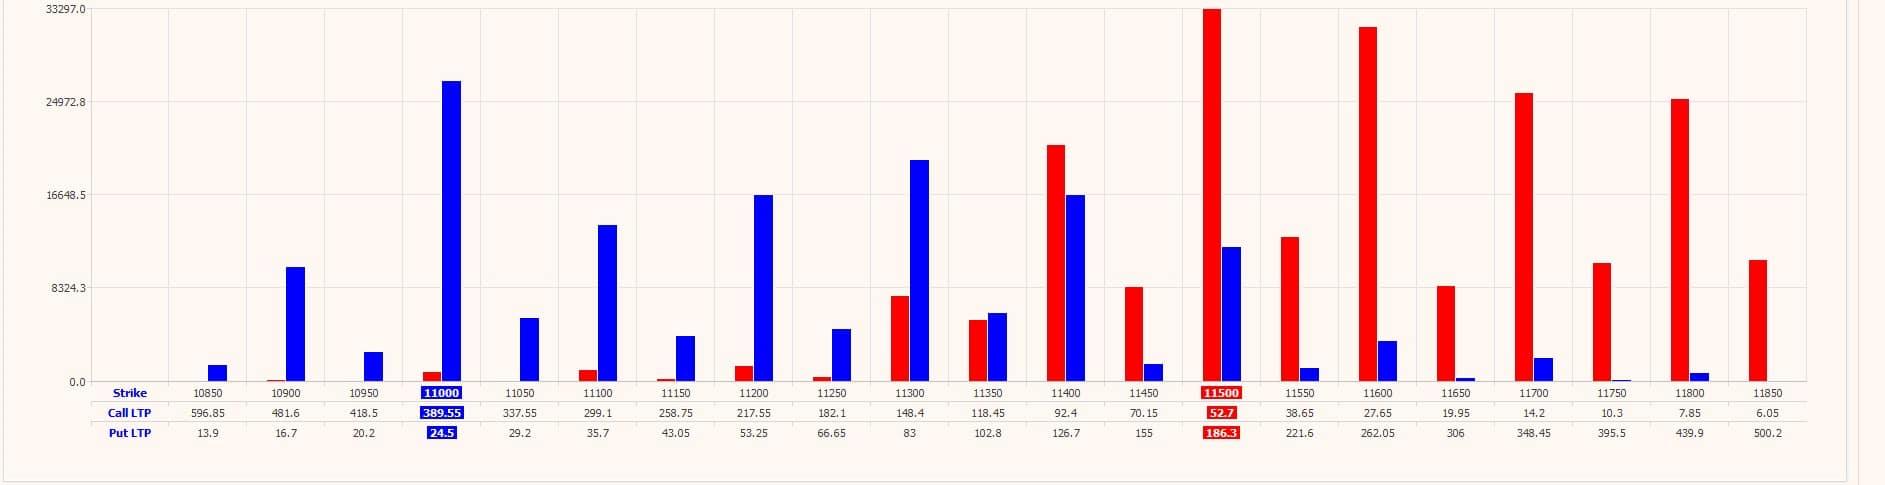 Algorithm of a successful trader